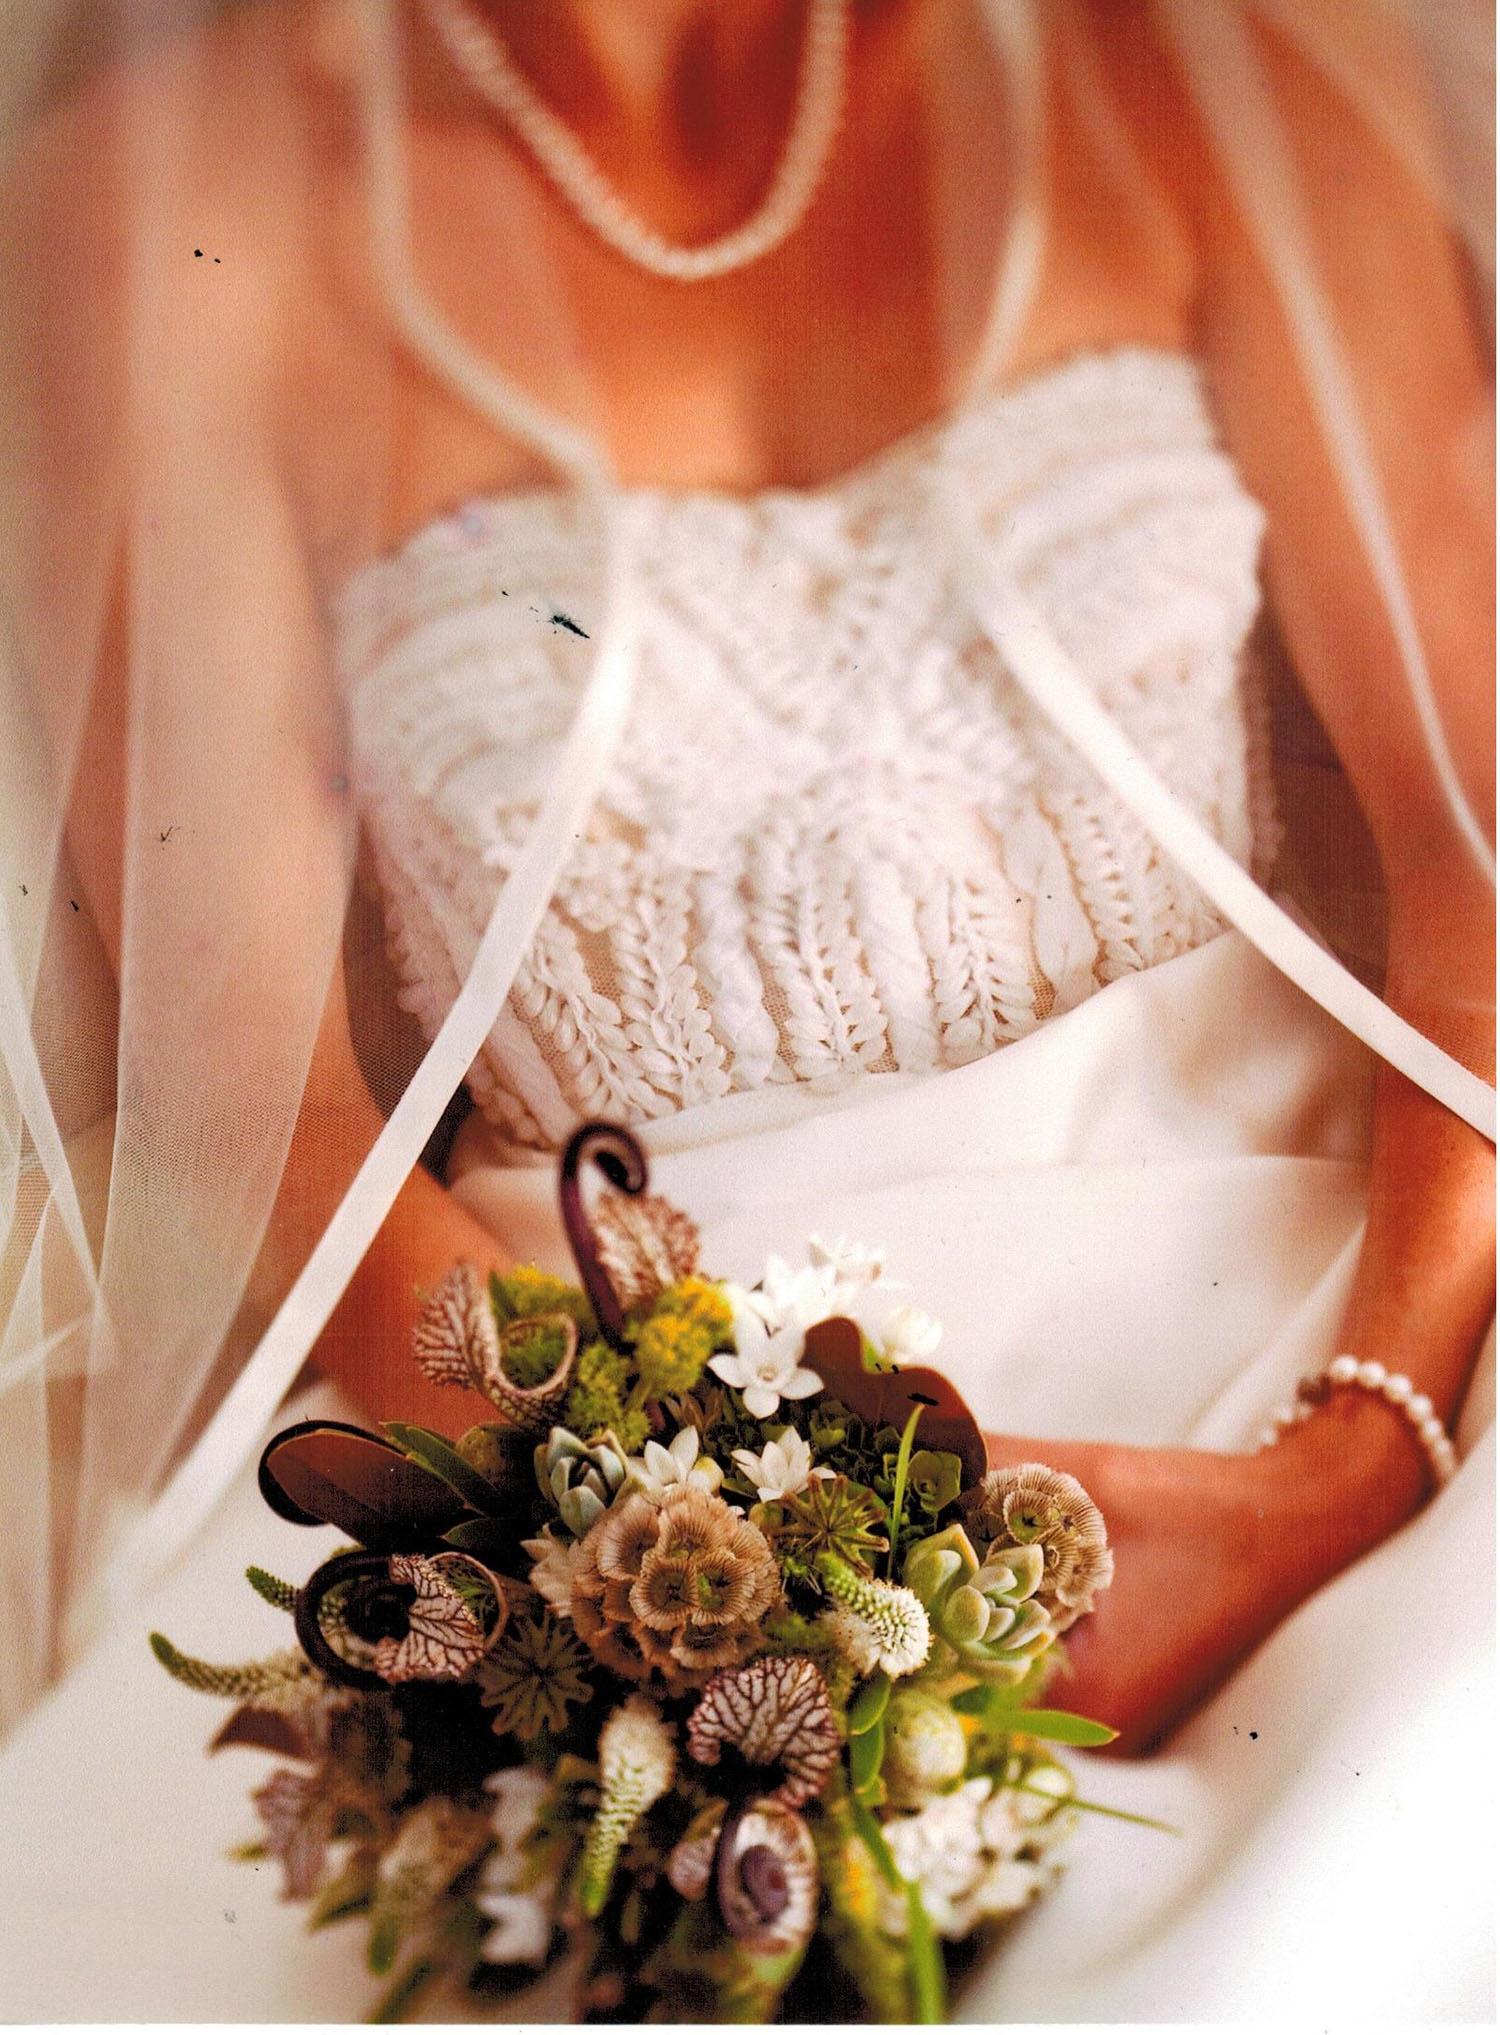 Tyler Boye Photography    Wedding Reception   The Hotel Dupont, Wilmington, DE